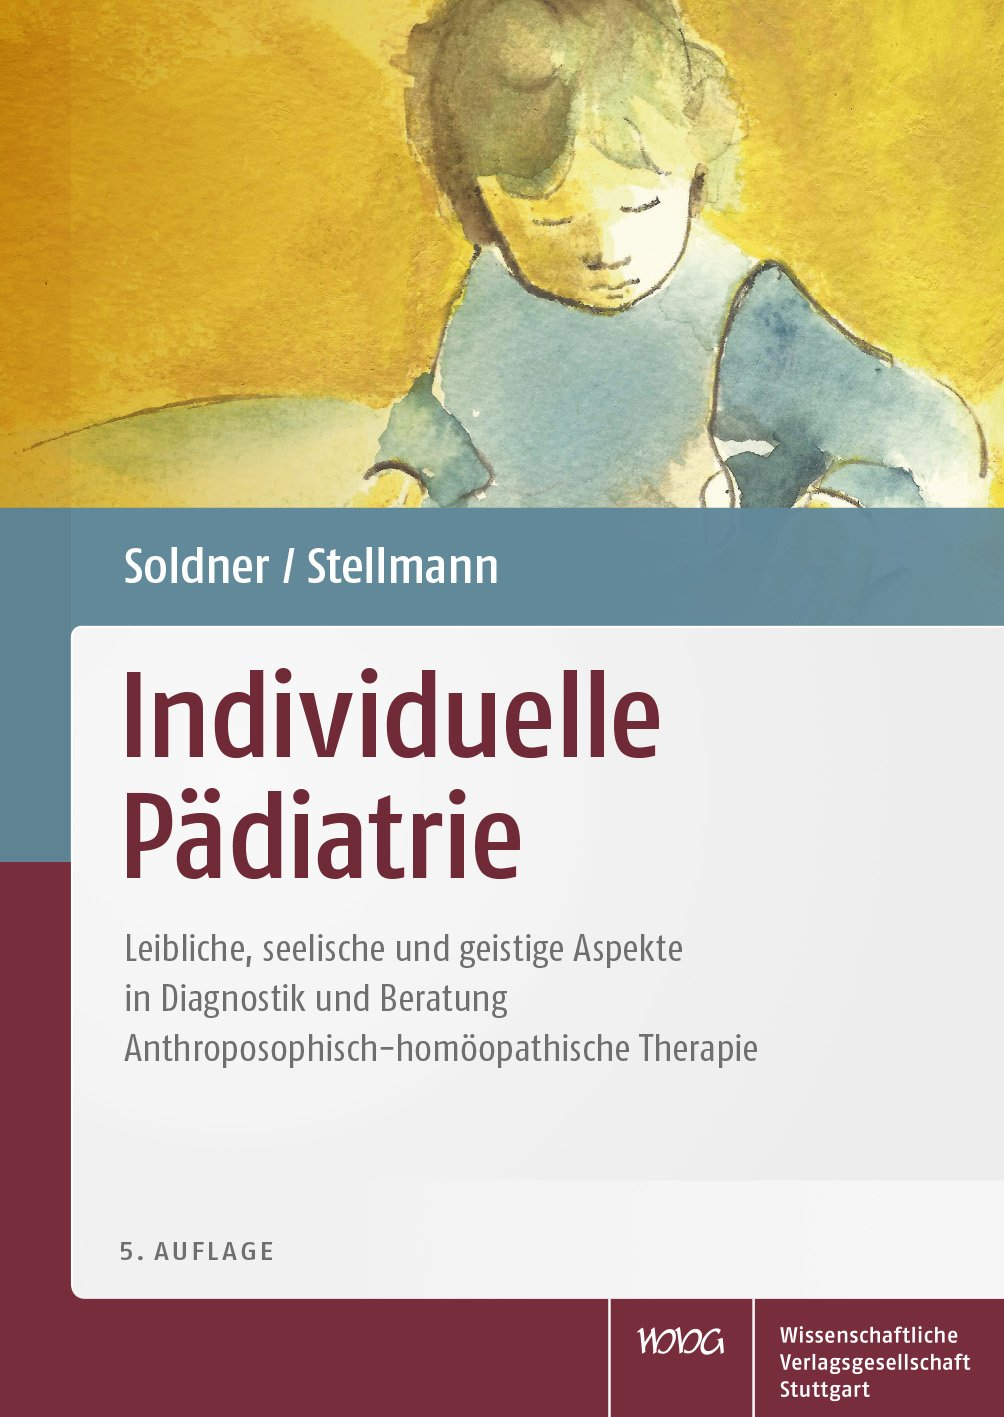 Individuelle Pädiatrie - Shop - Mediengruppe Deutscher Apotheker Verlag